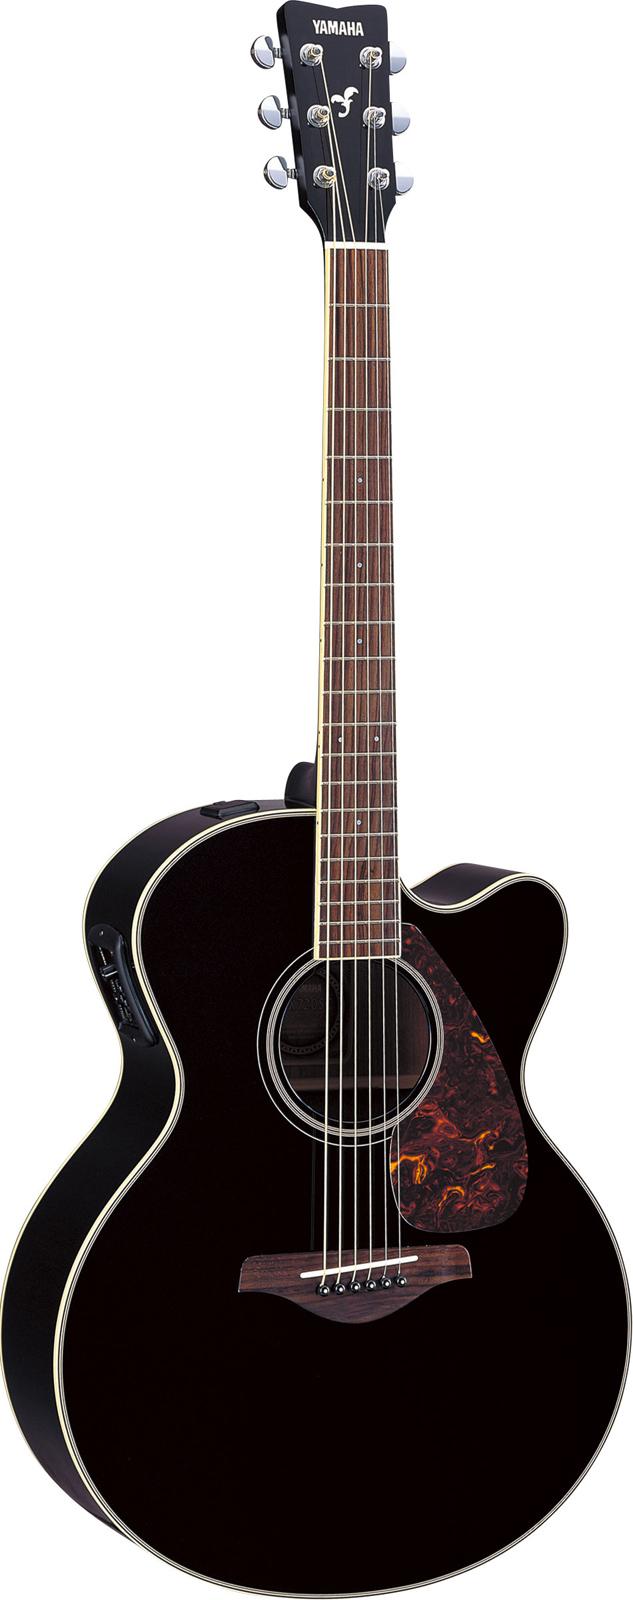 Yamaha Fjx720sciibl Black